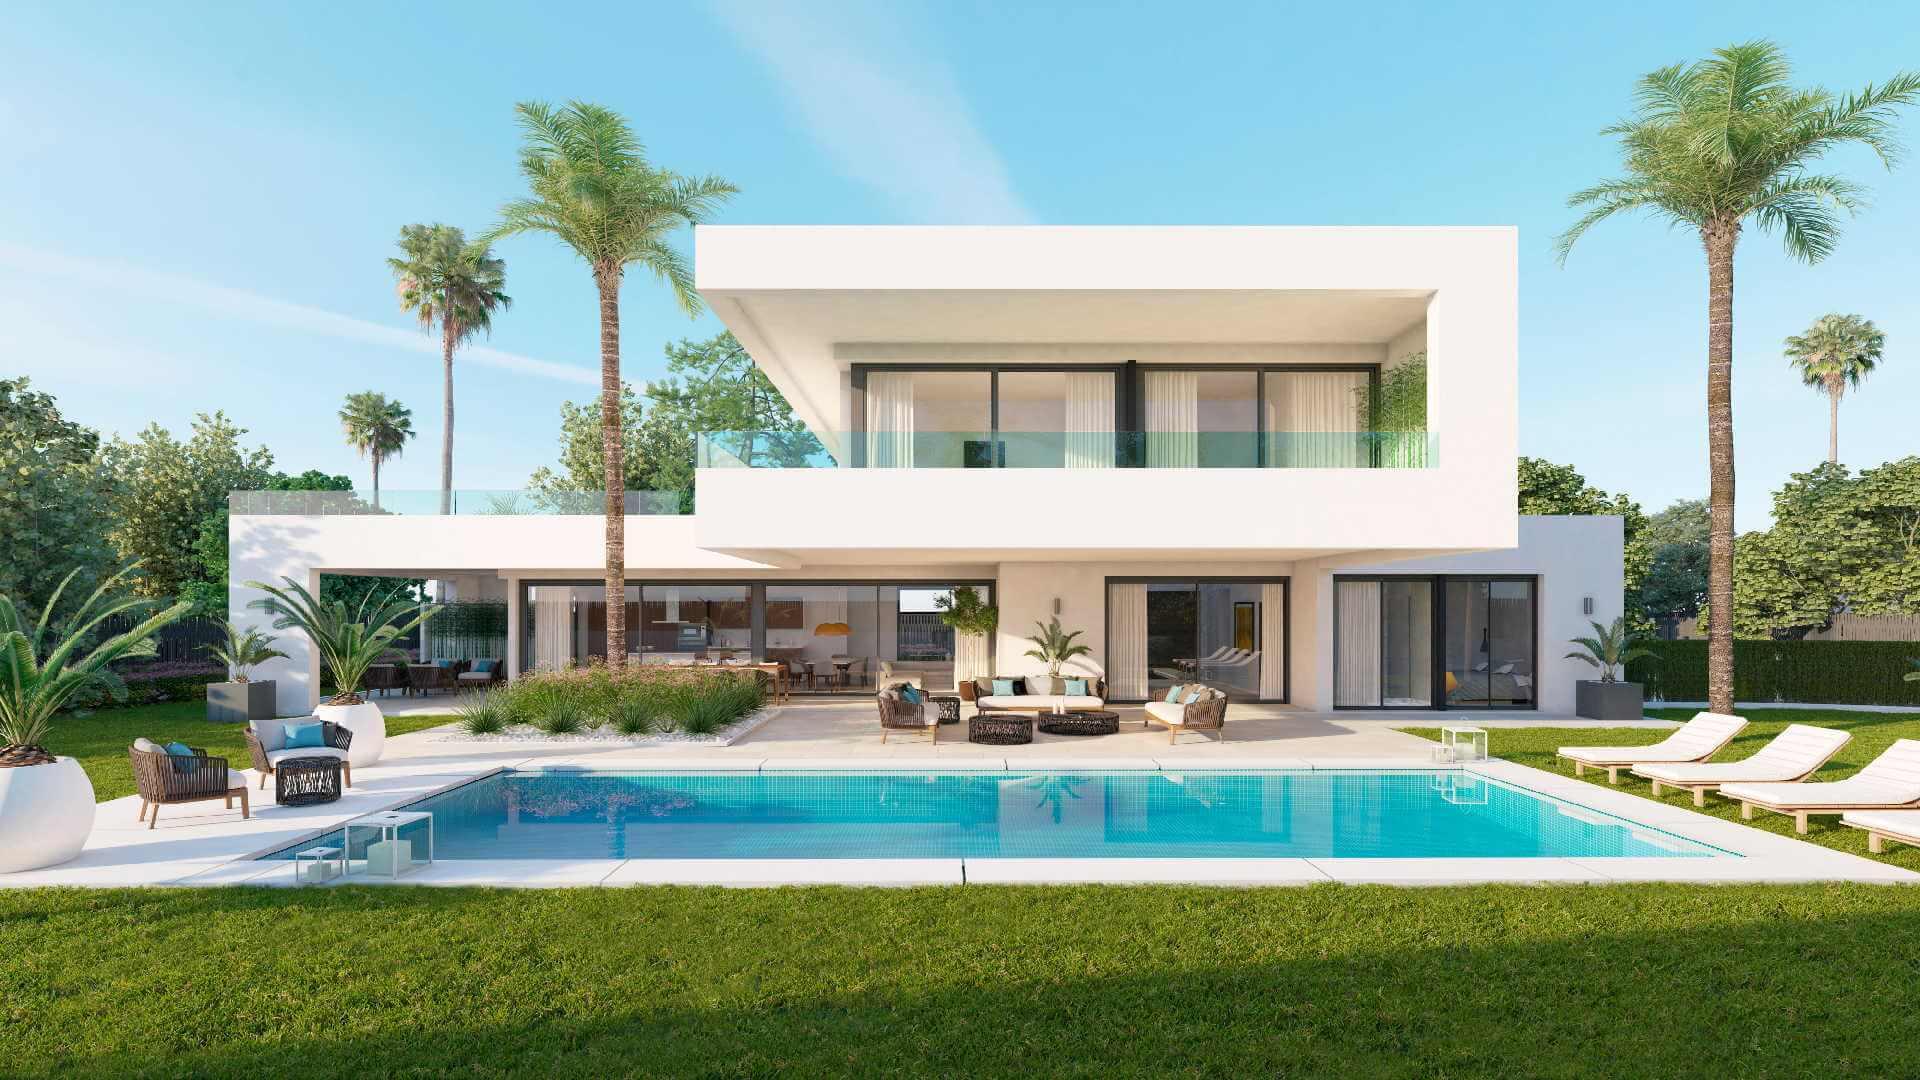 los olivos exclusieve villa 39 s in een residenti le setting. Black Bedroom Furniture Sets. Home Design Ideas